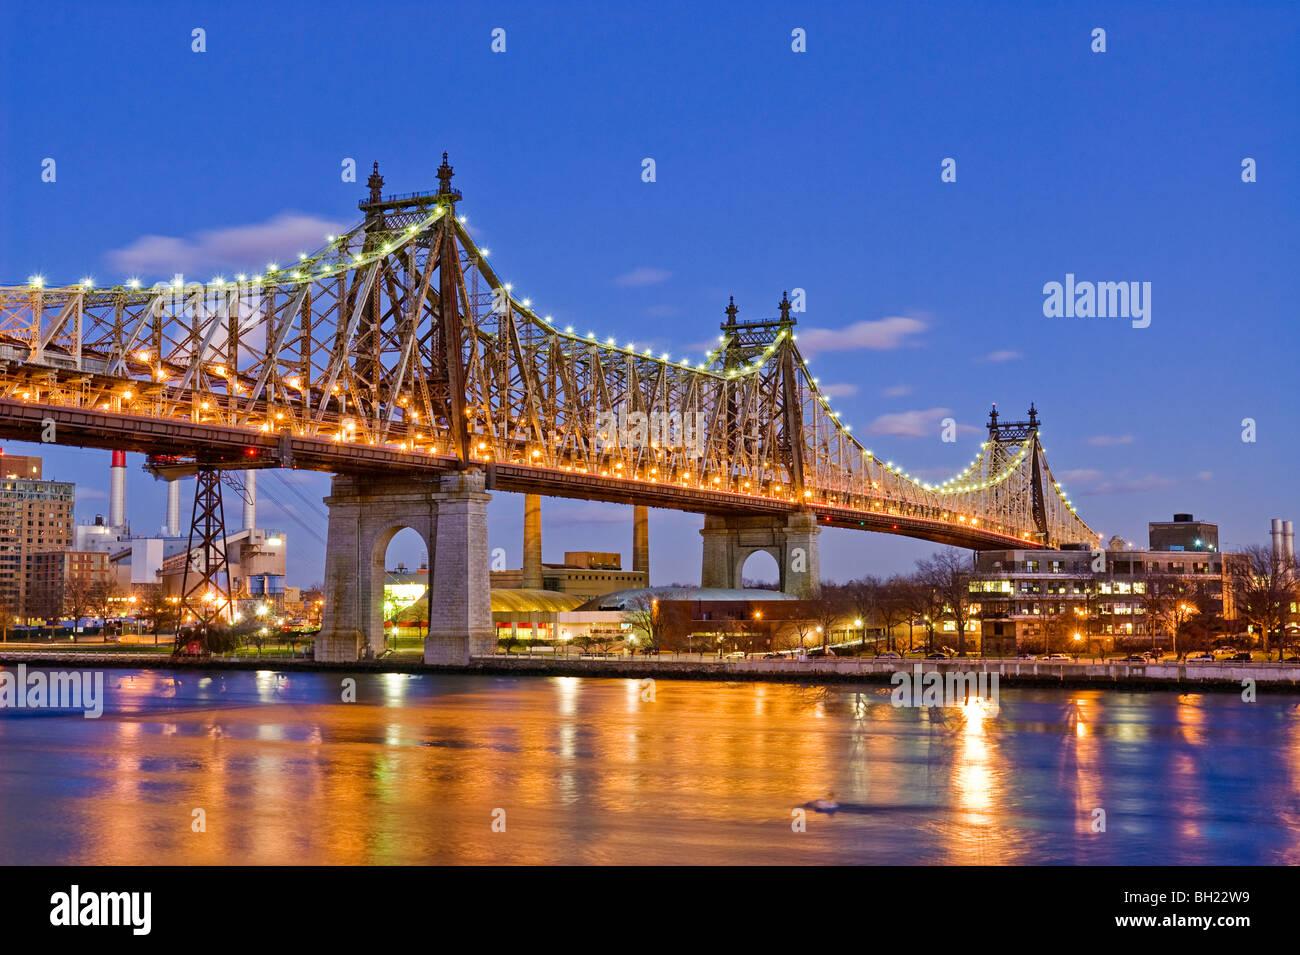 Die 59th Street, Queensboro Bridge und dem East River, New York City. Stockbild